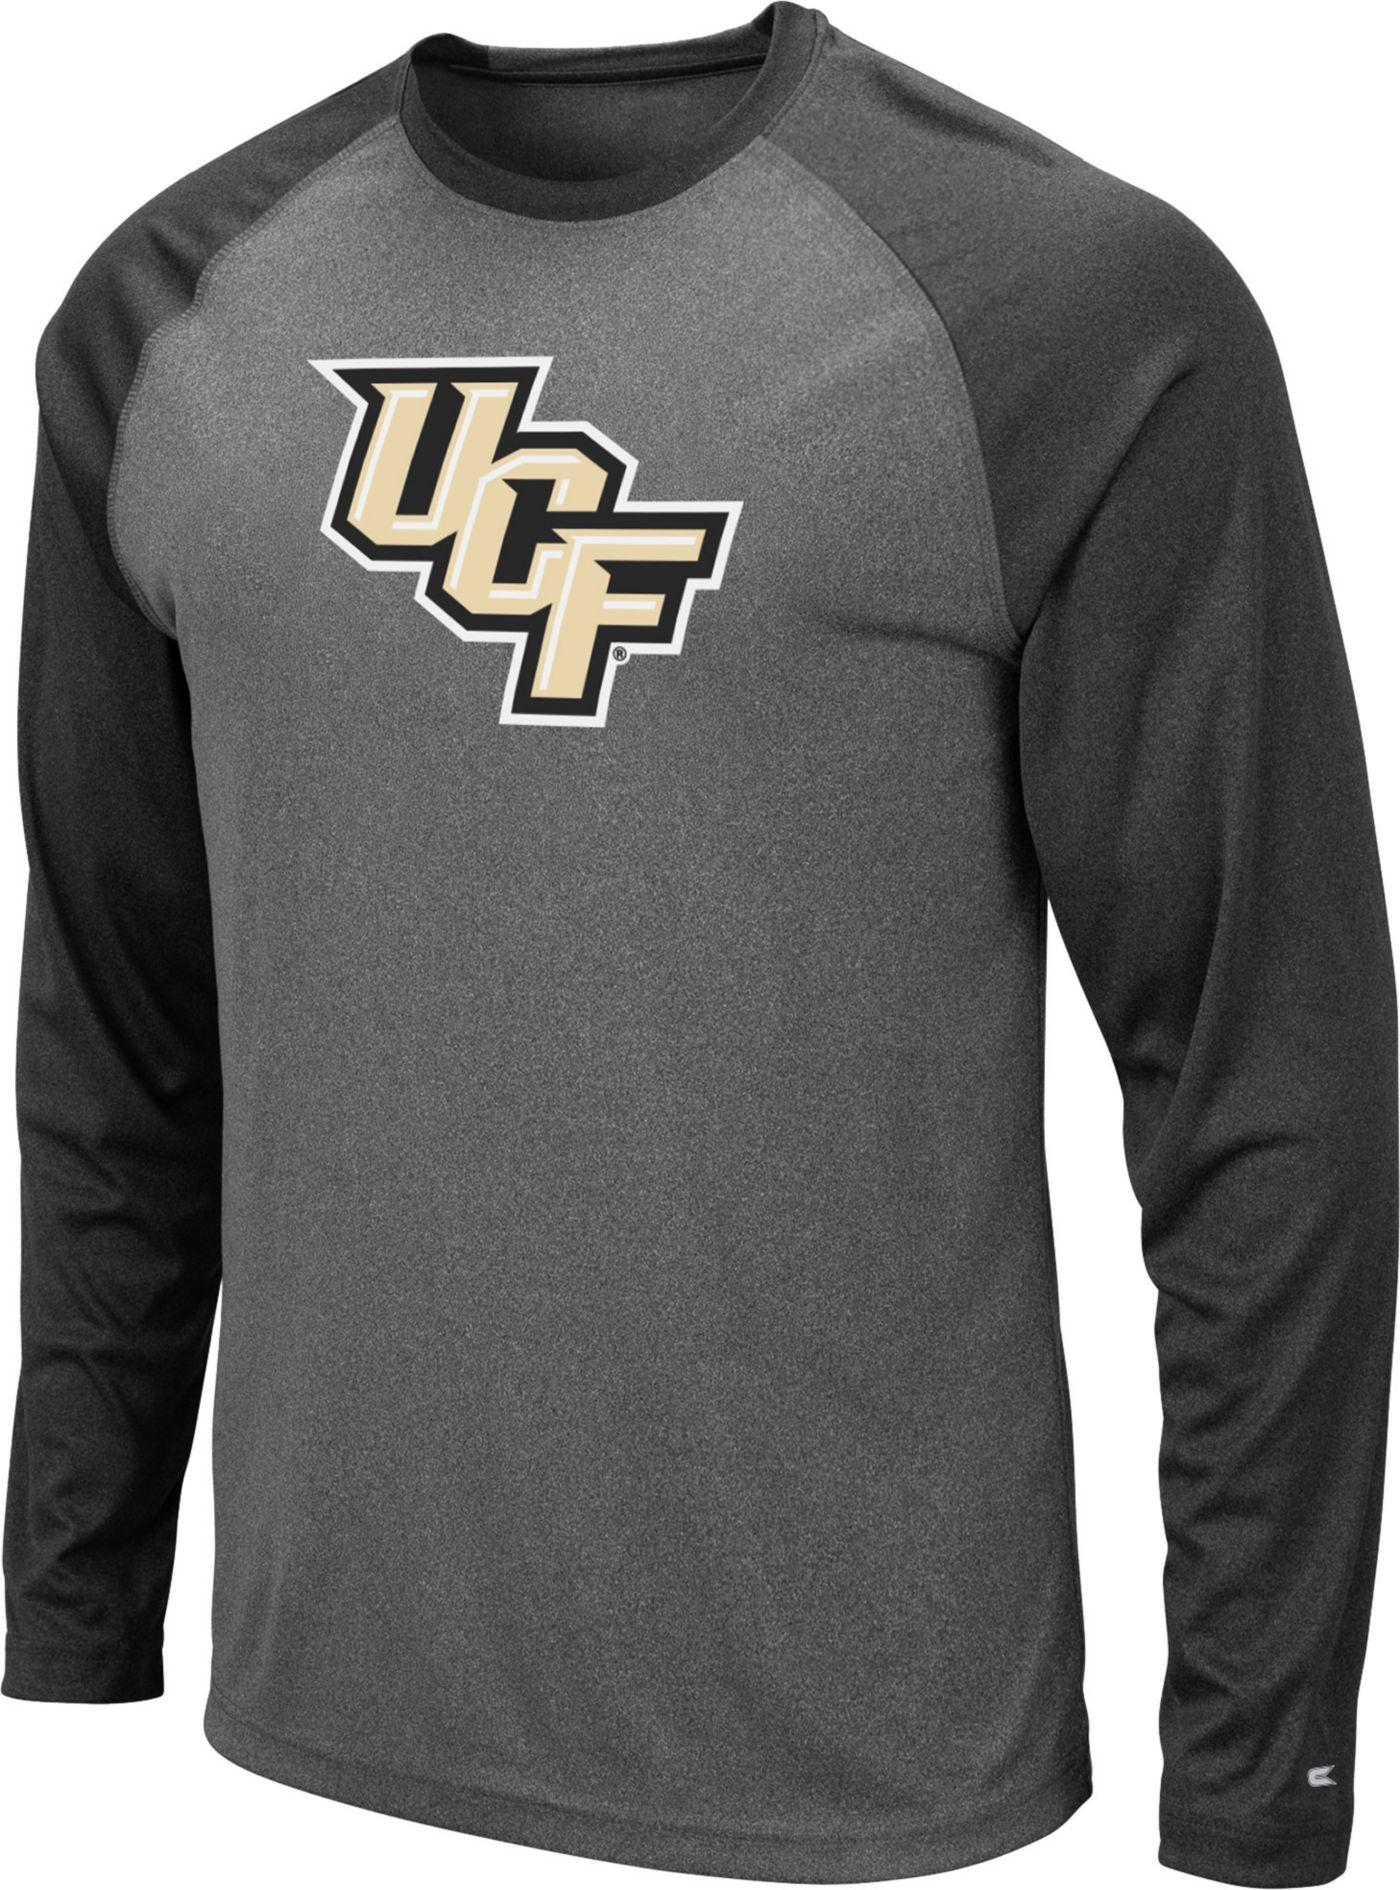 Colosseum Men's UCF Knights Grey Rad Tad Raglan Long Sleeve T-Shirt